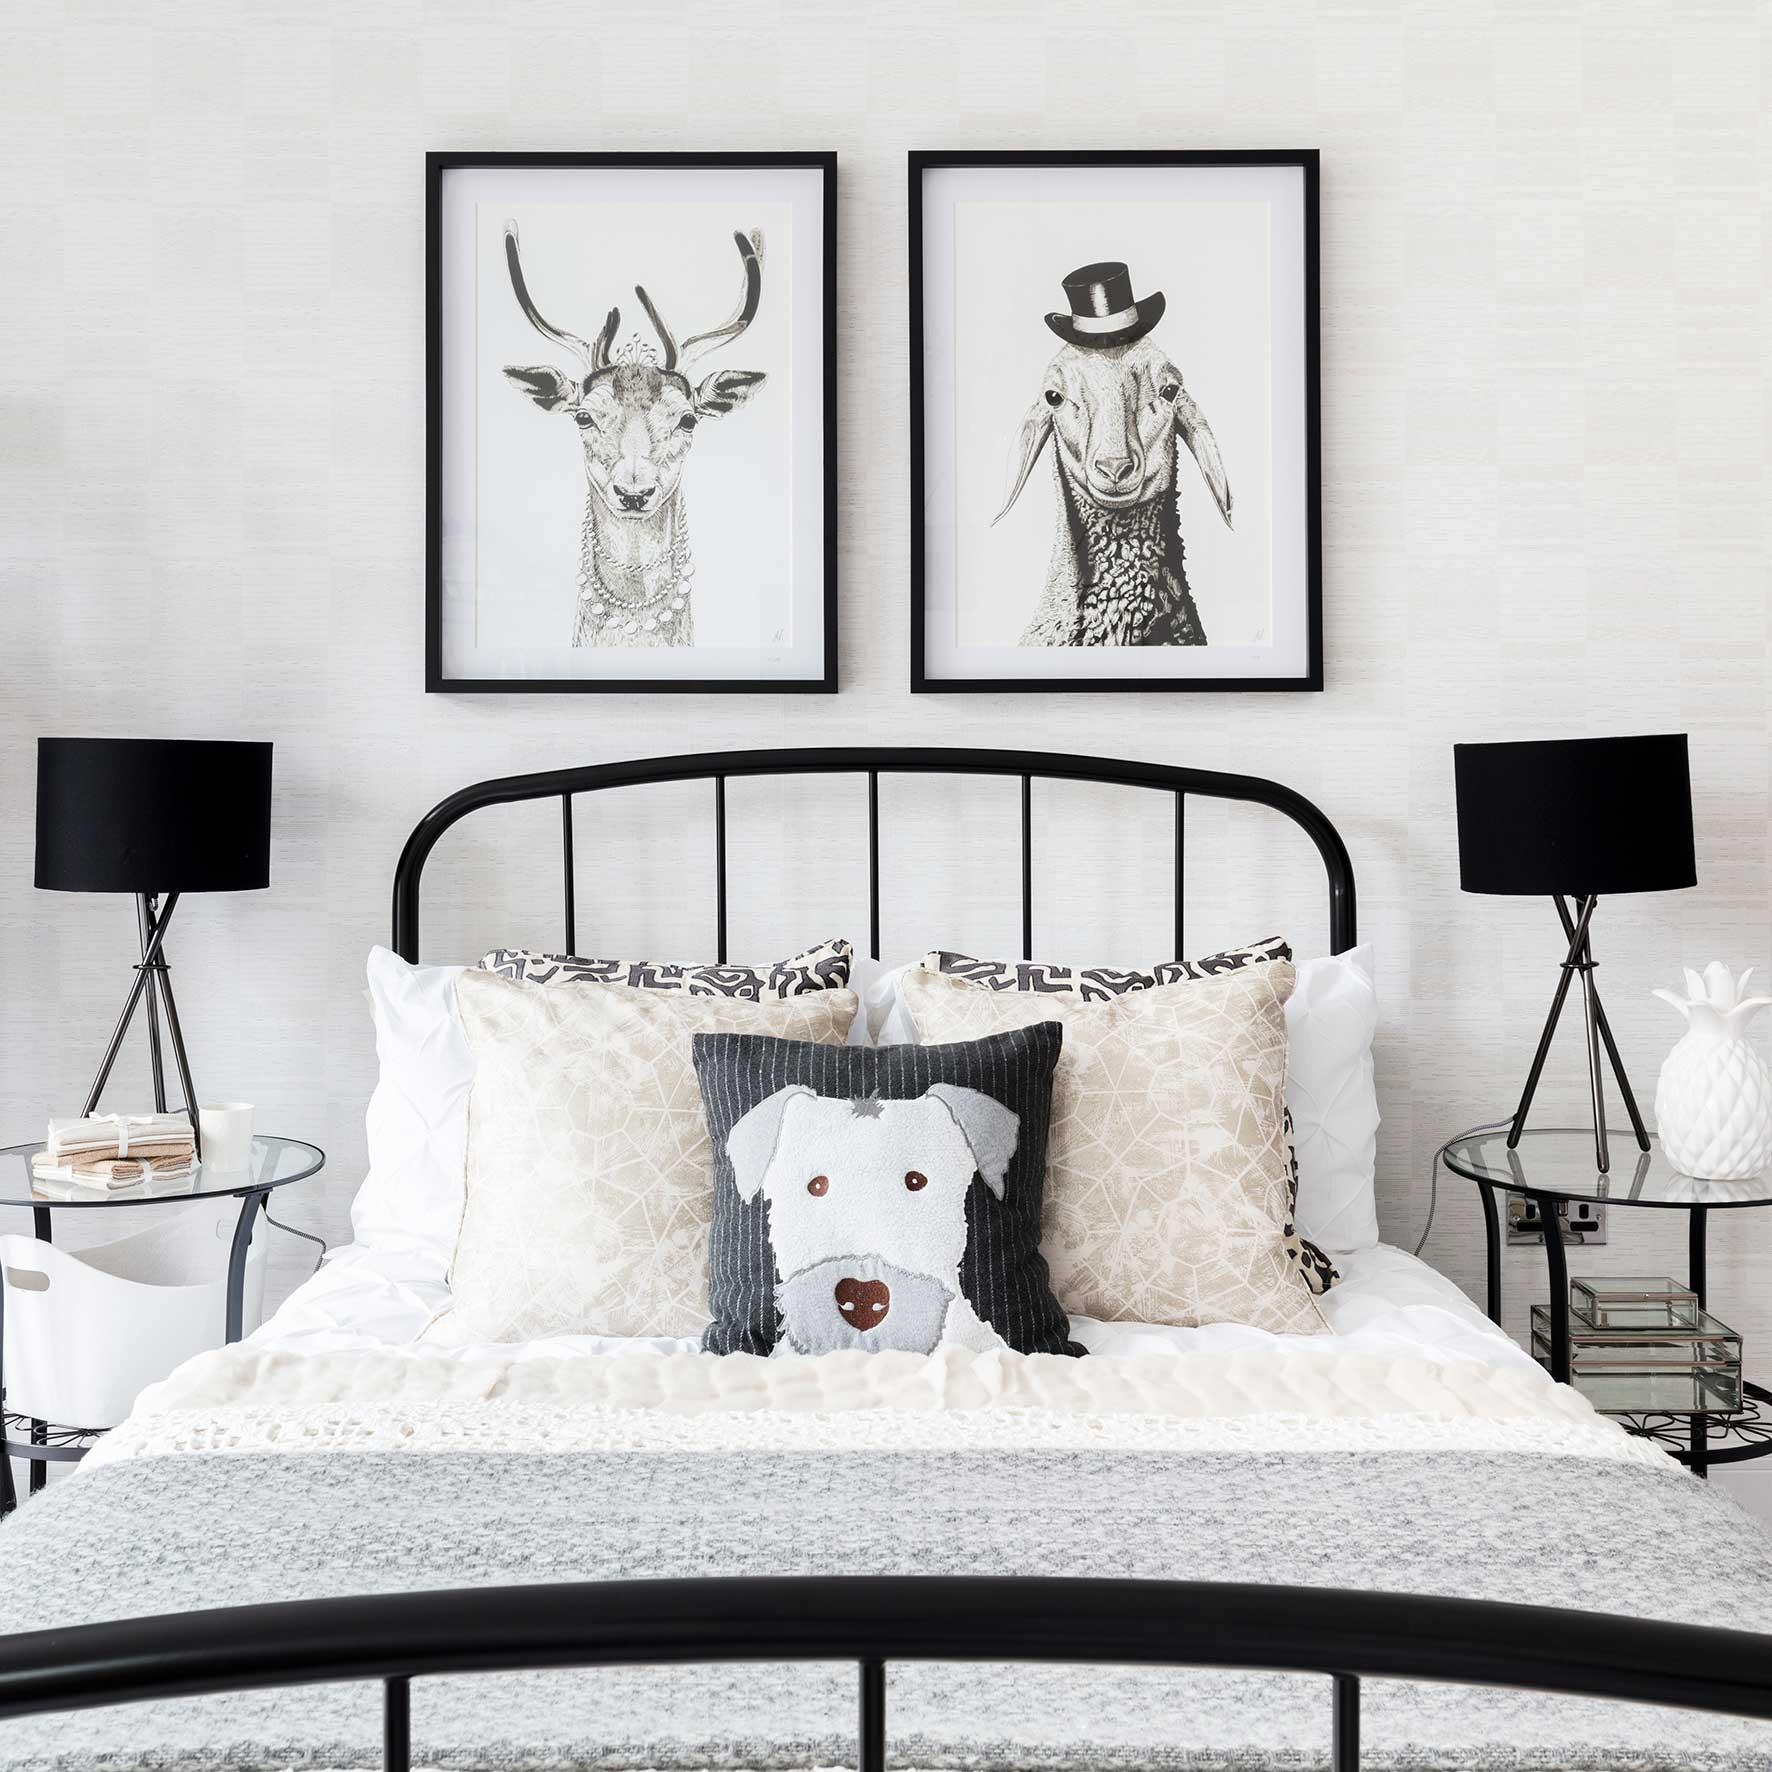 ANTLER HOMES Chamberlain Place Weybridge show home by Suna Interior Design kids bedroom.jpg